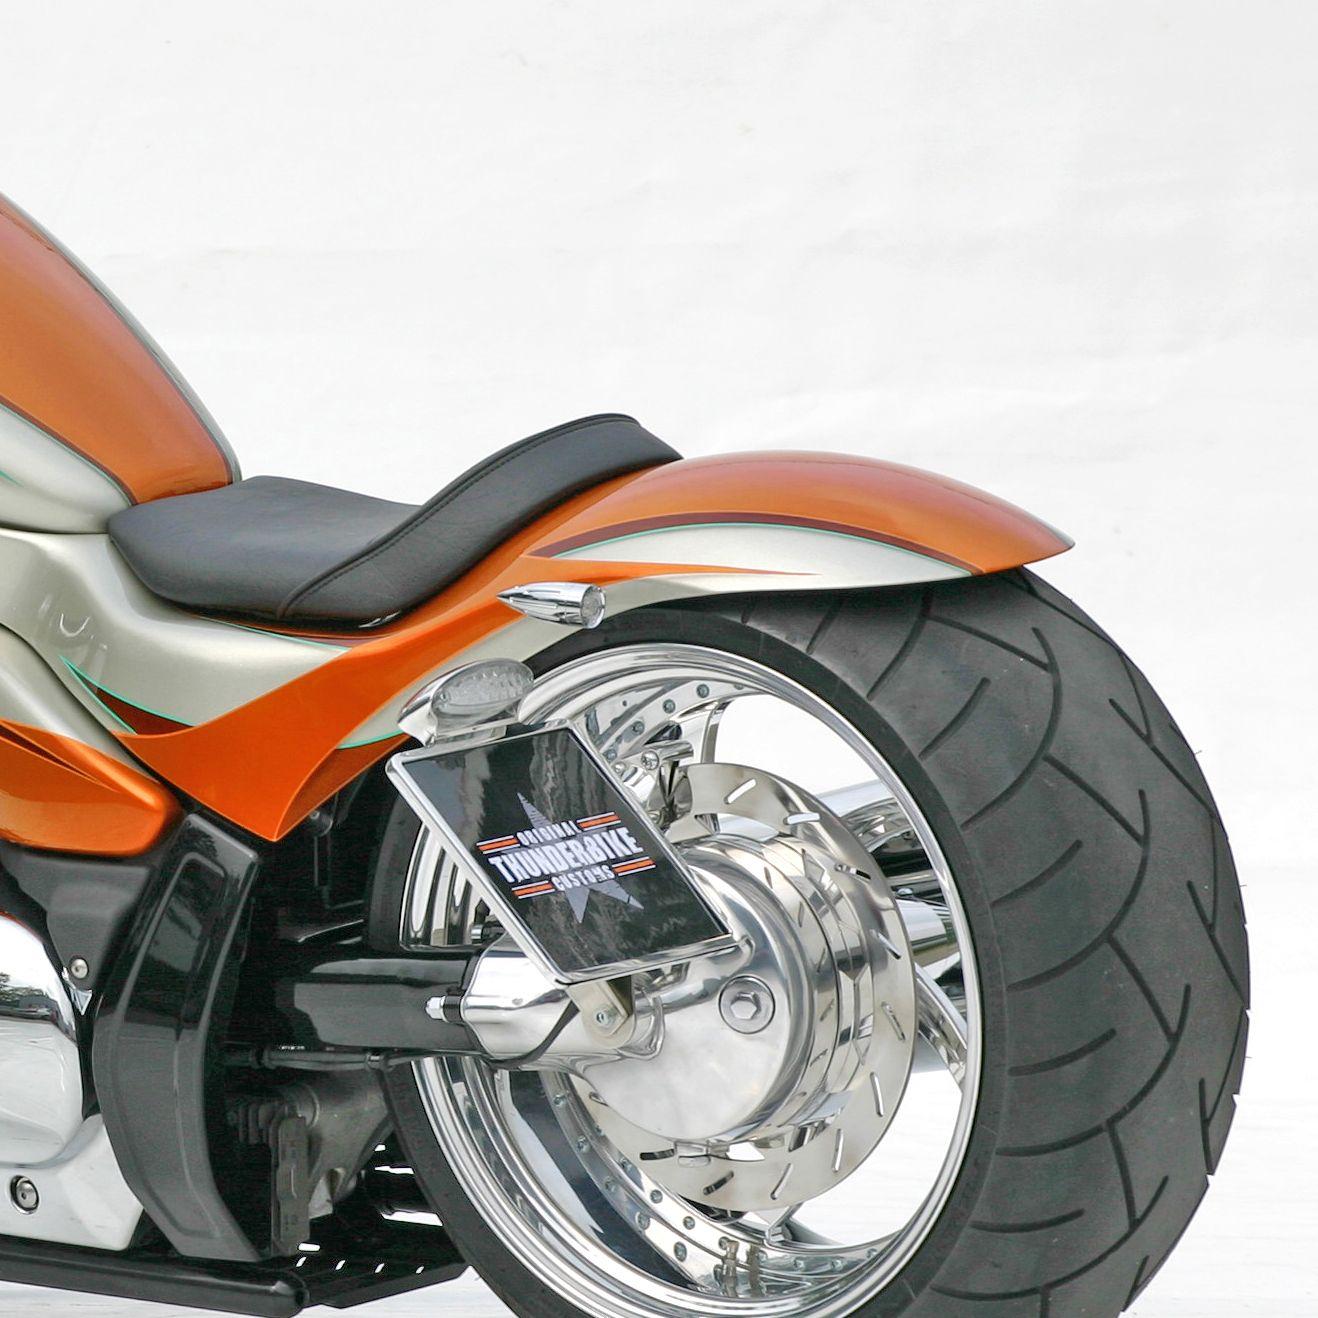 Rear fender Hardrace for M1800 at Thunderbike Shop